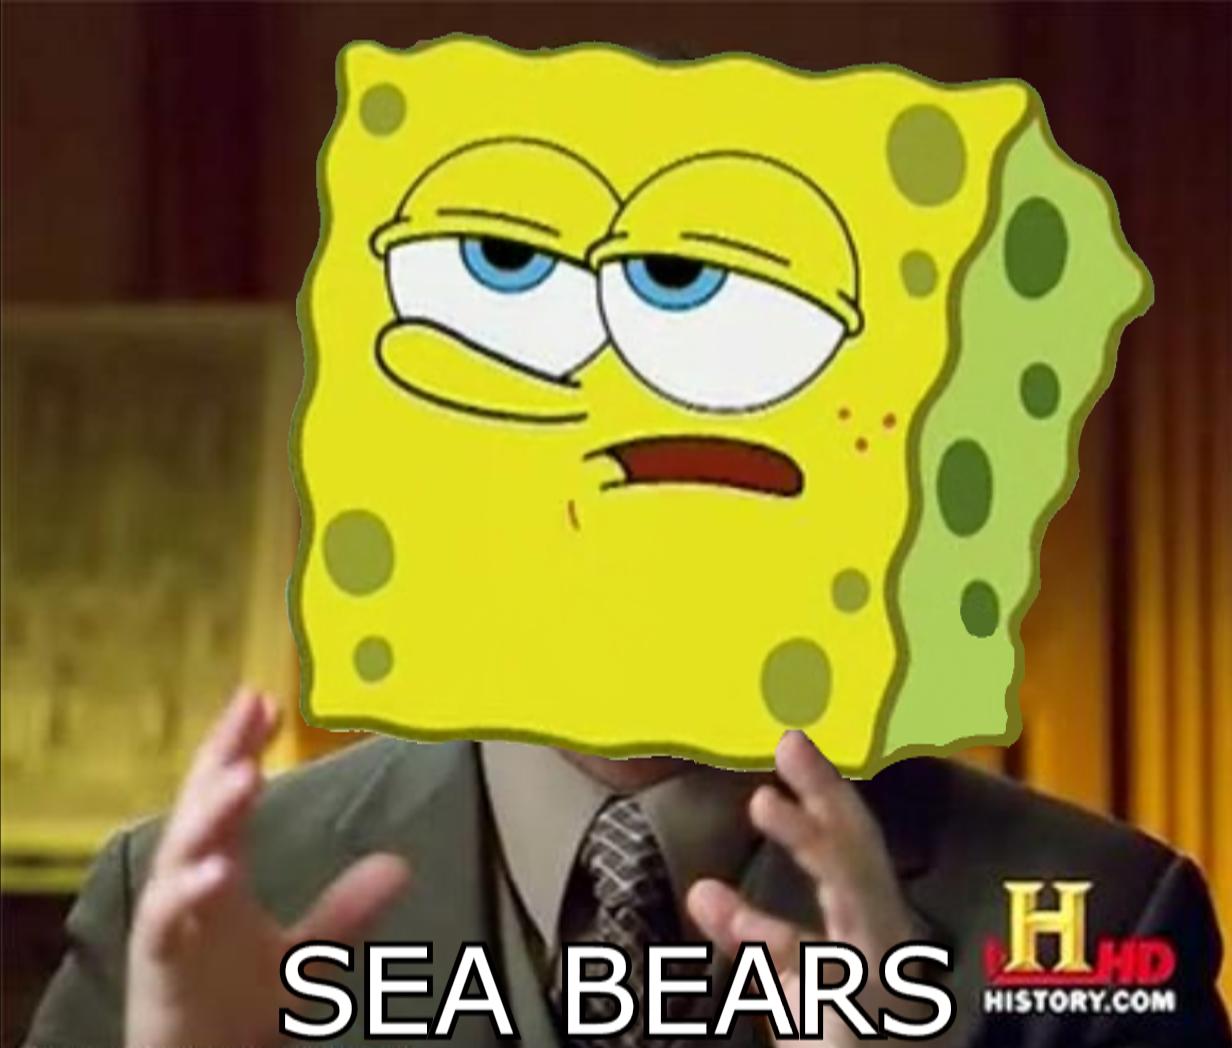 Sea bears history com face cartoon yellow facial expression head smile